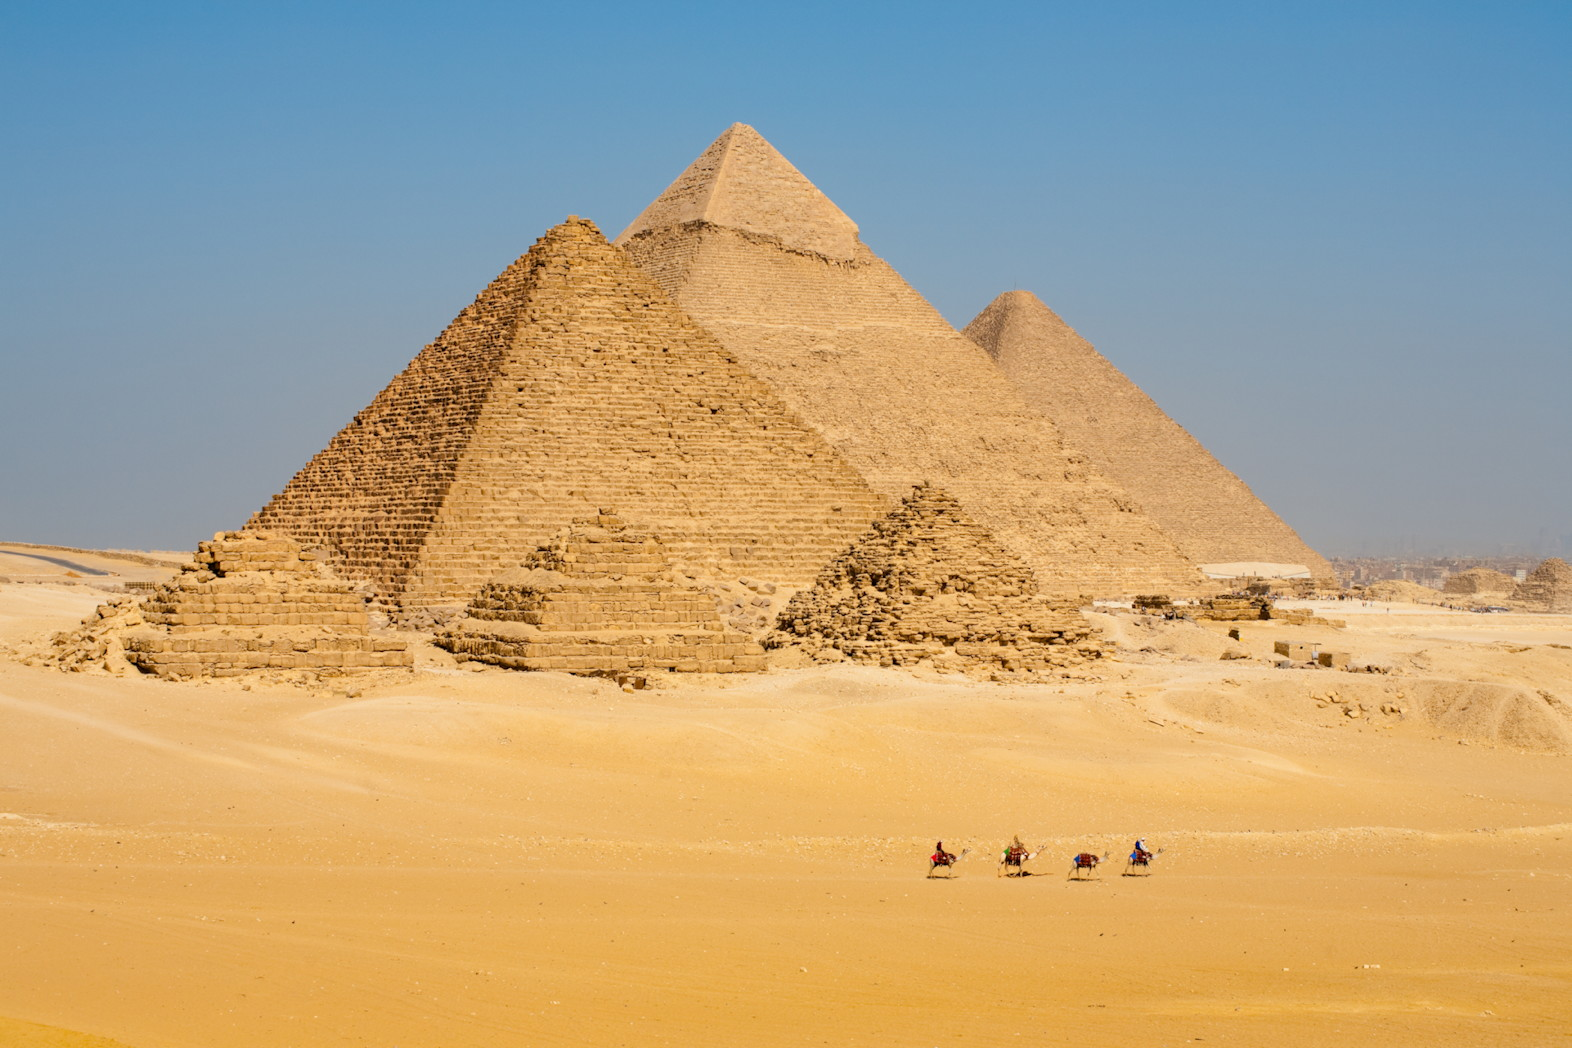 Row Camels Walk Pyramids Together